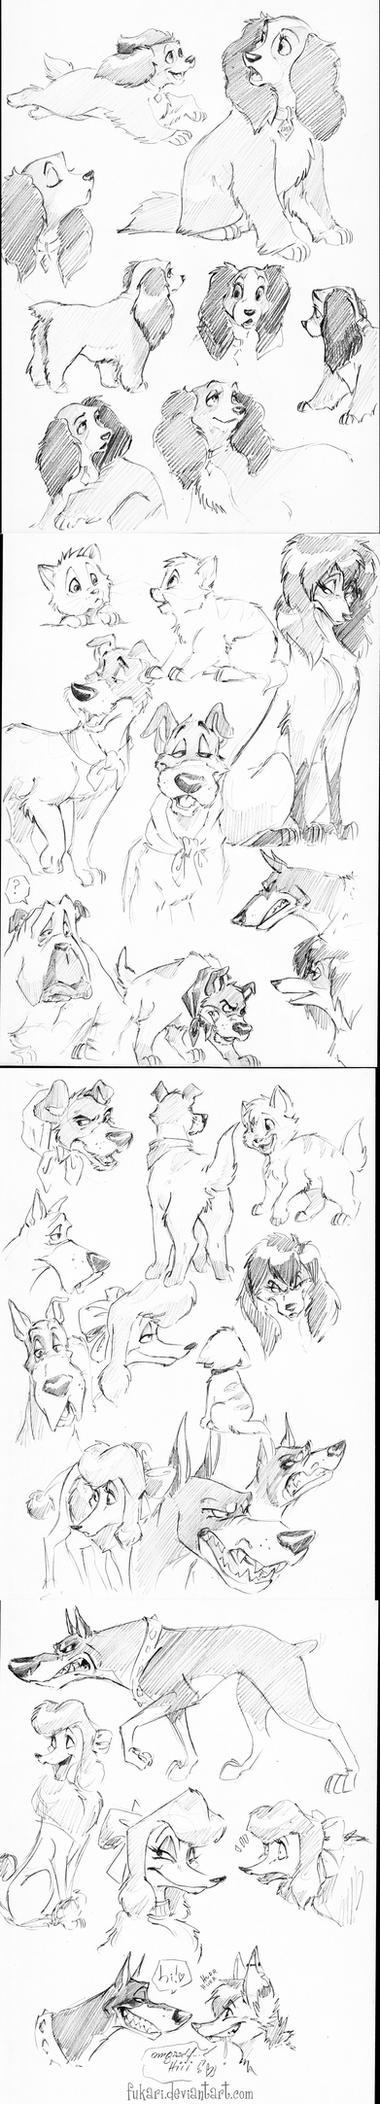 Disney dogs by Fukari